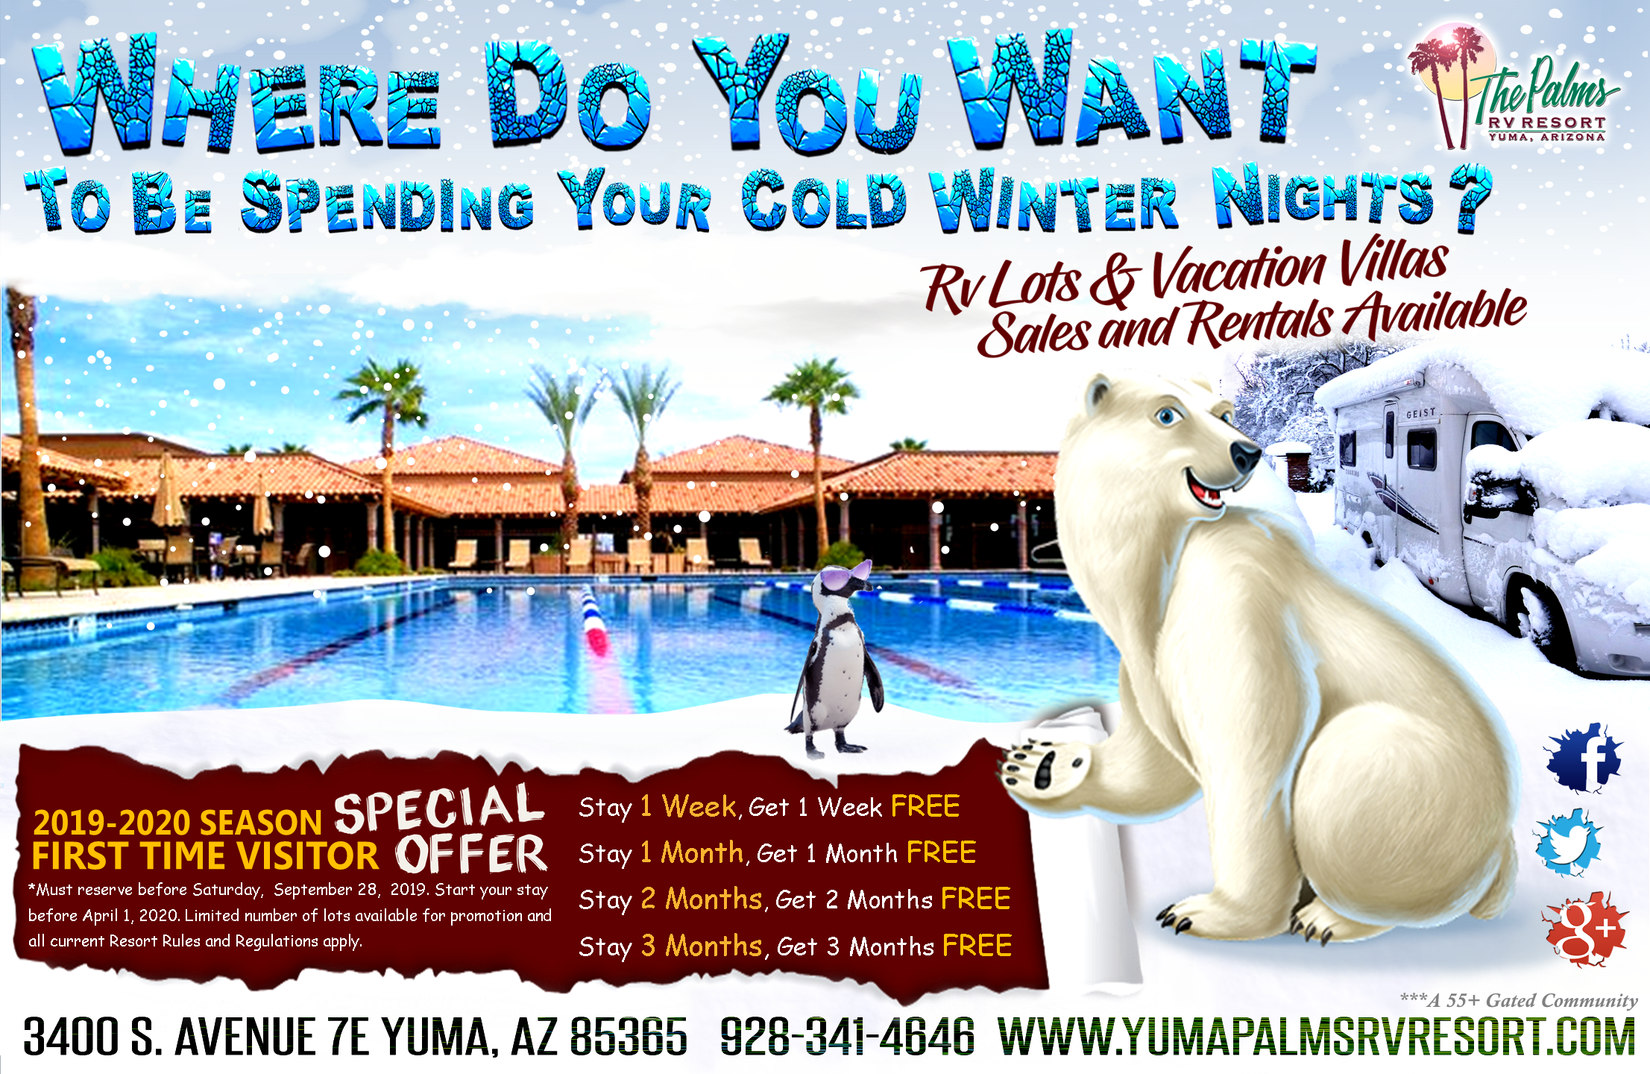 The Palms Rv Resort Yuma Arizona